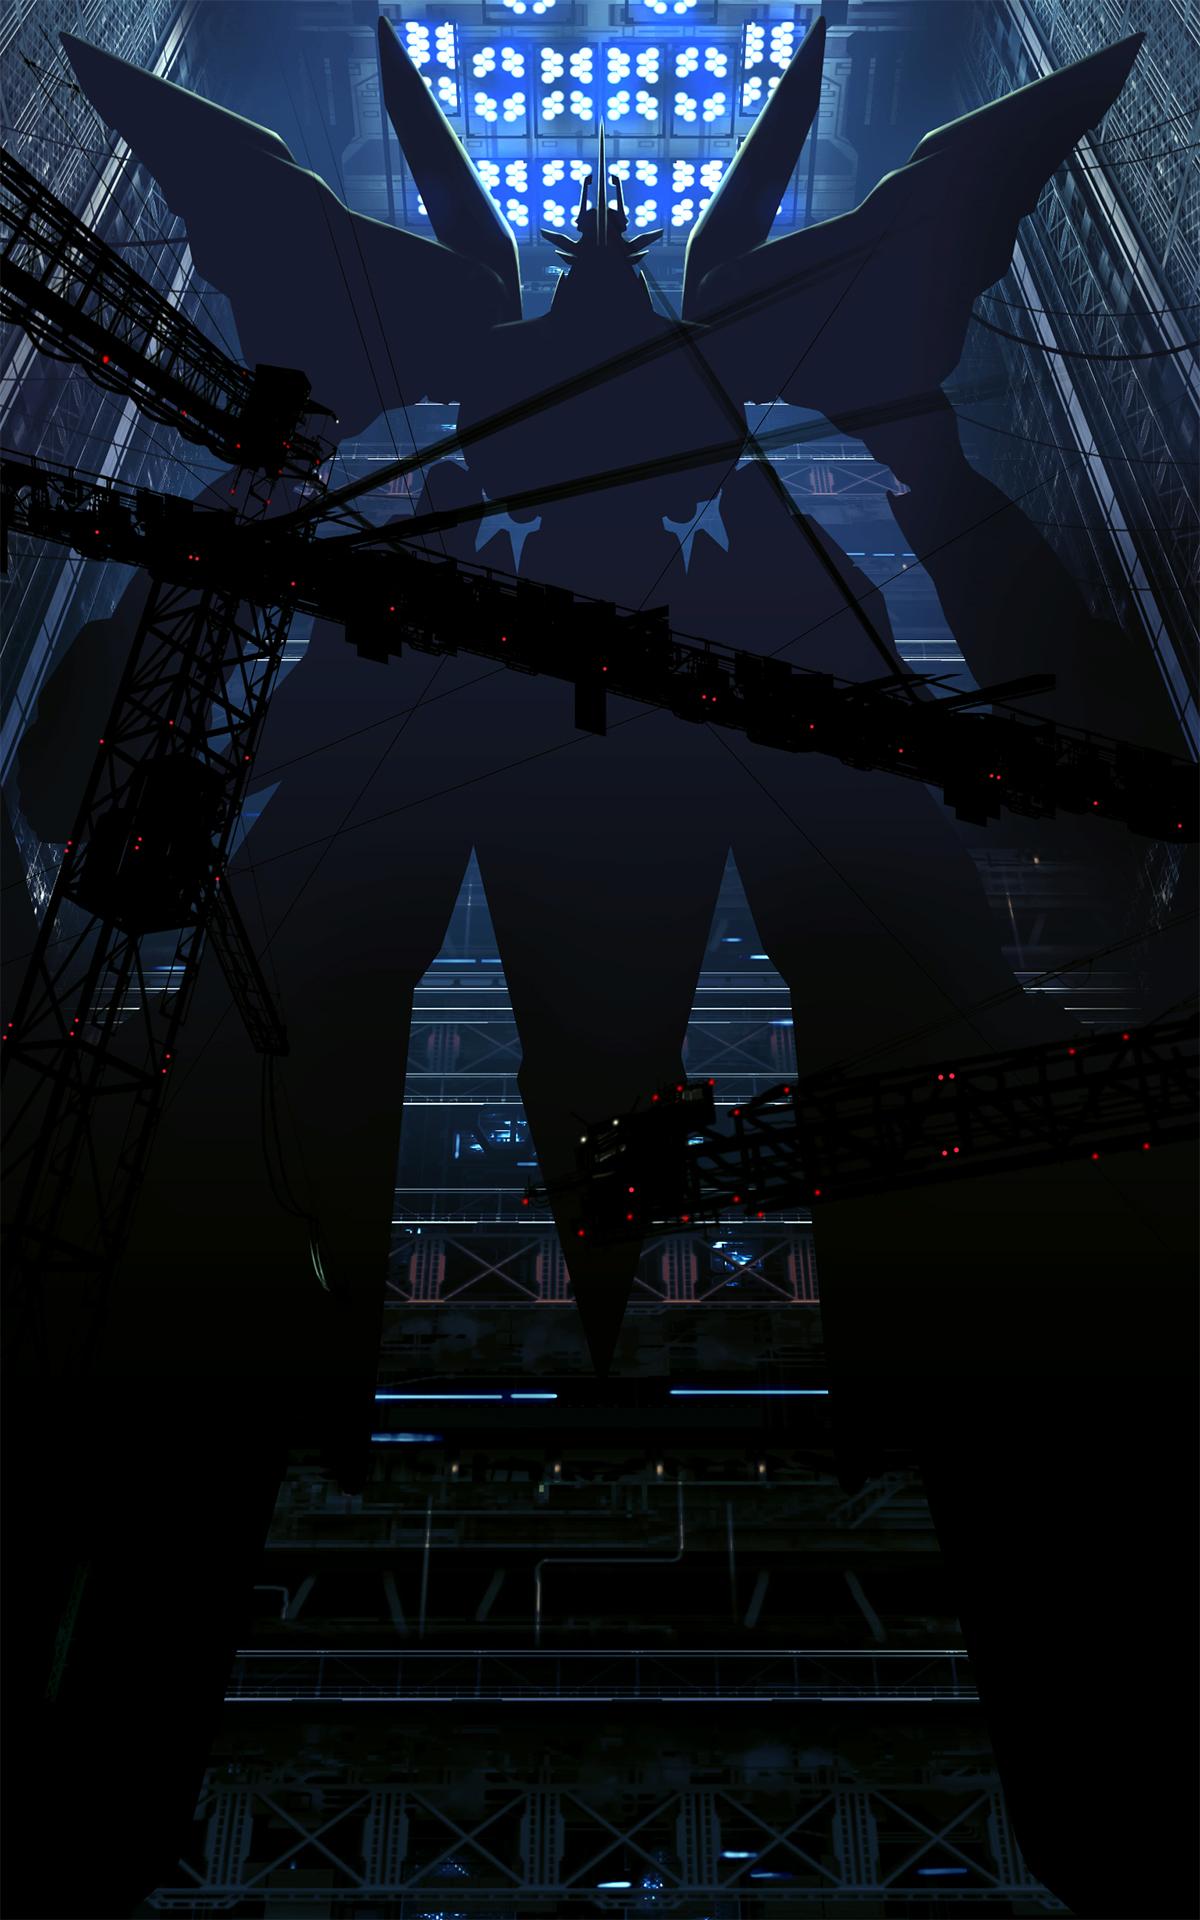 night anime reflection futuristic artwork symmetry skyscraper blue science fiction mech metropolis midnight light shape darkness